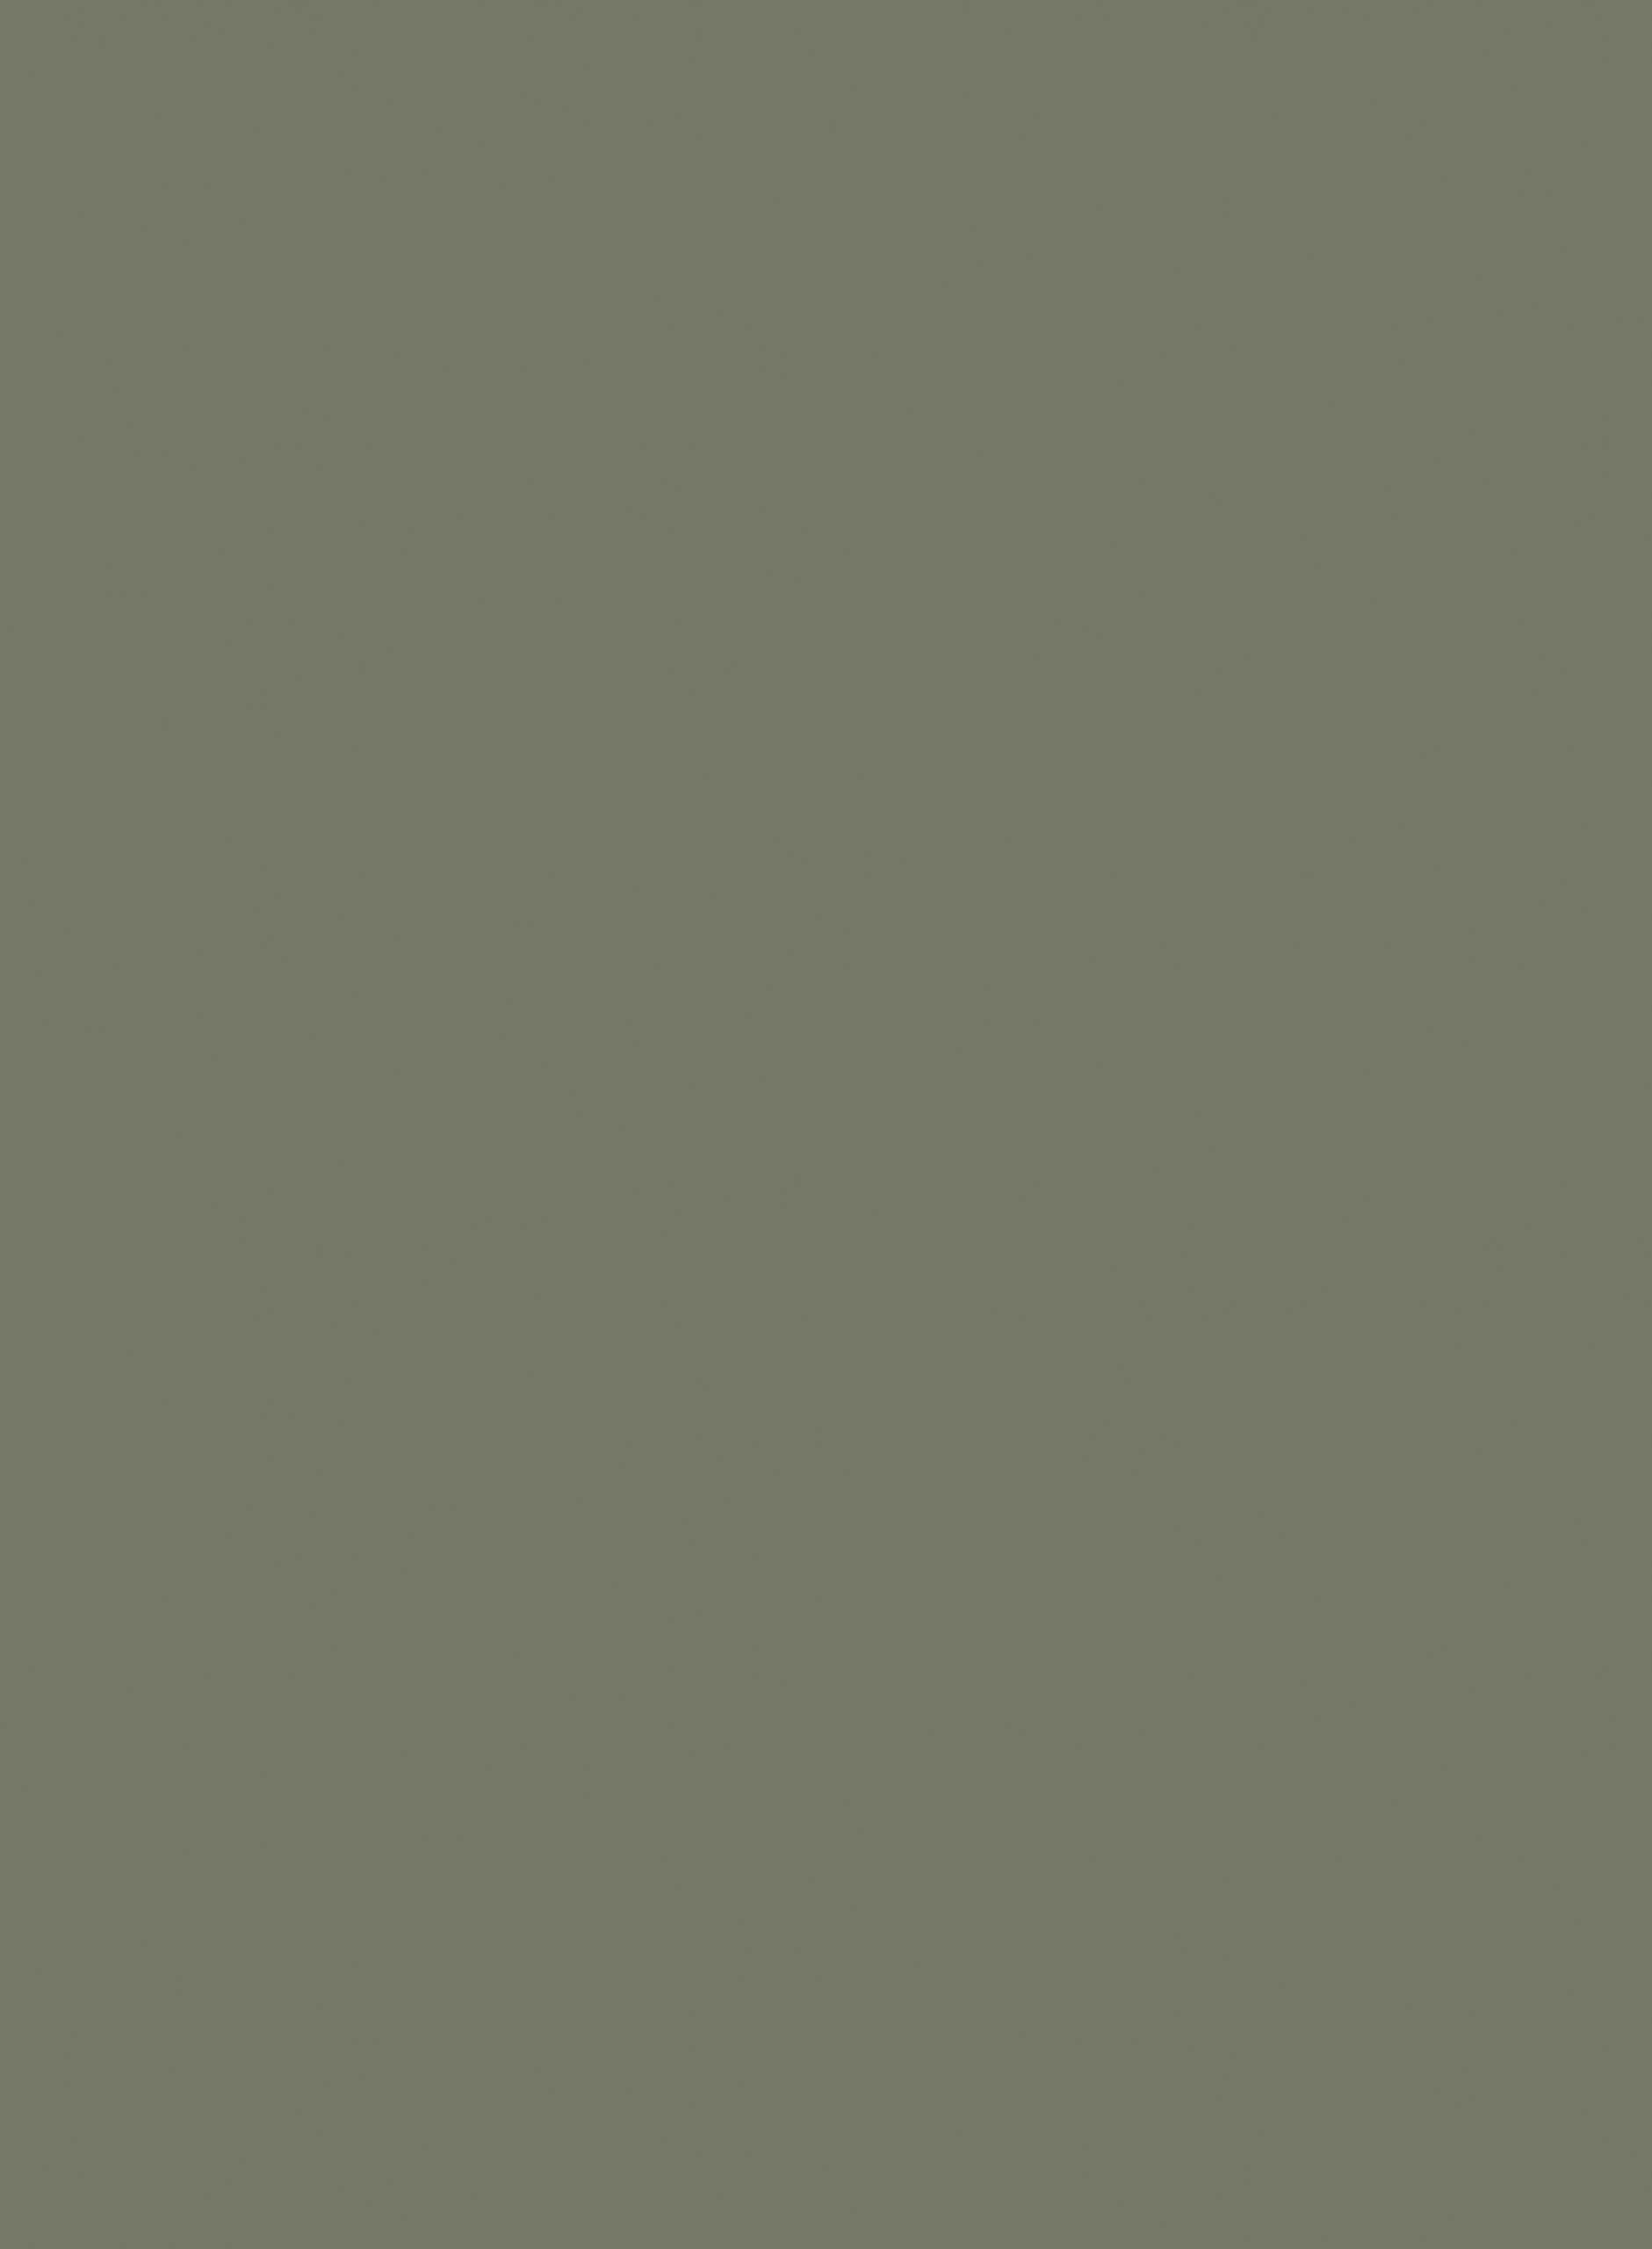 UB54 Ovatta volledige plaatafbeelding